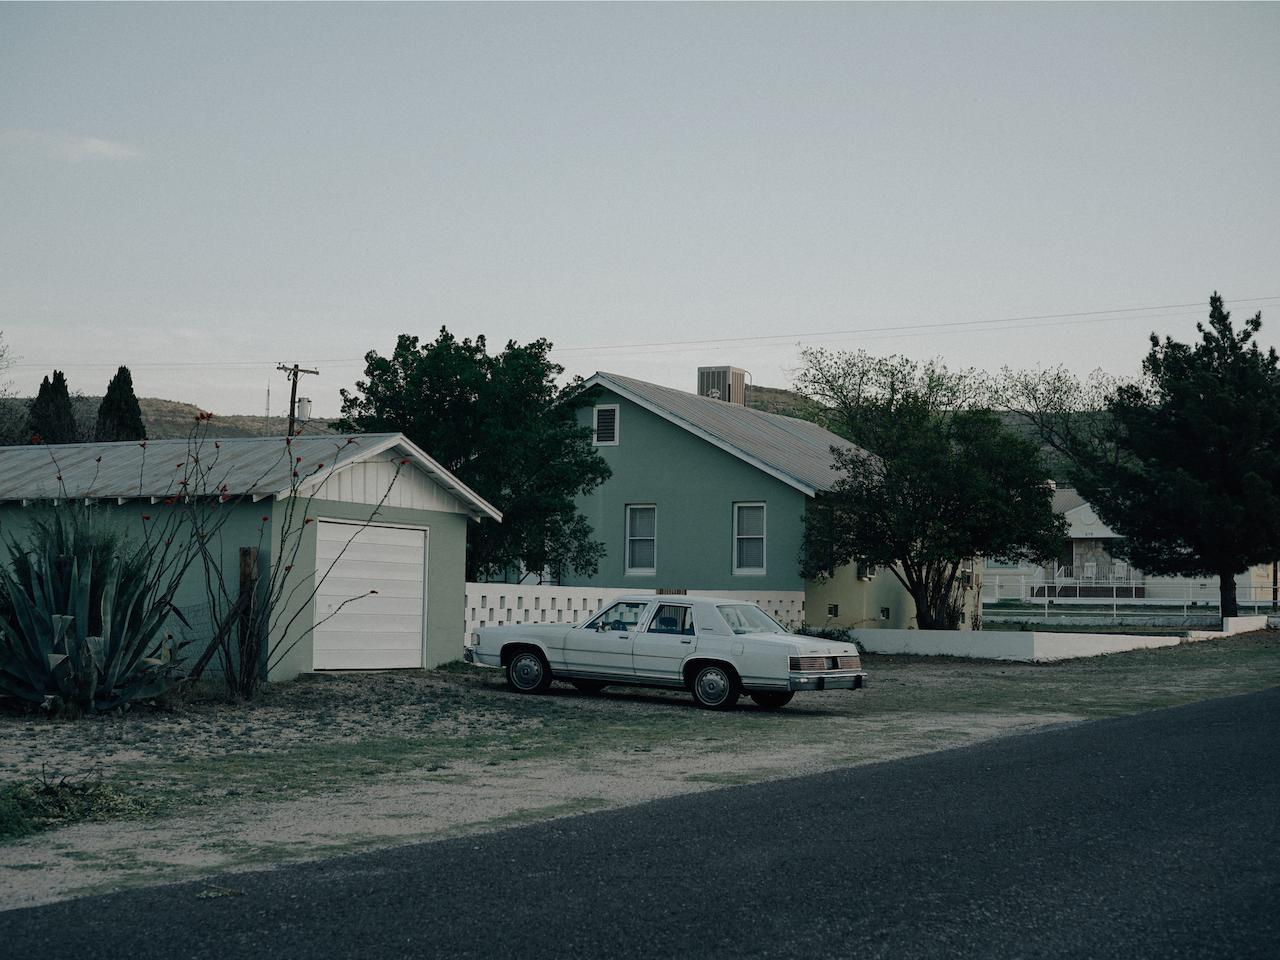 BORDERLAND TX